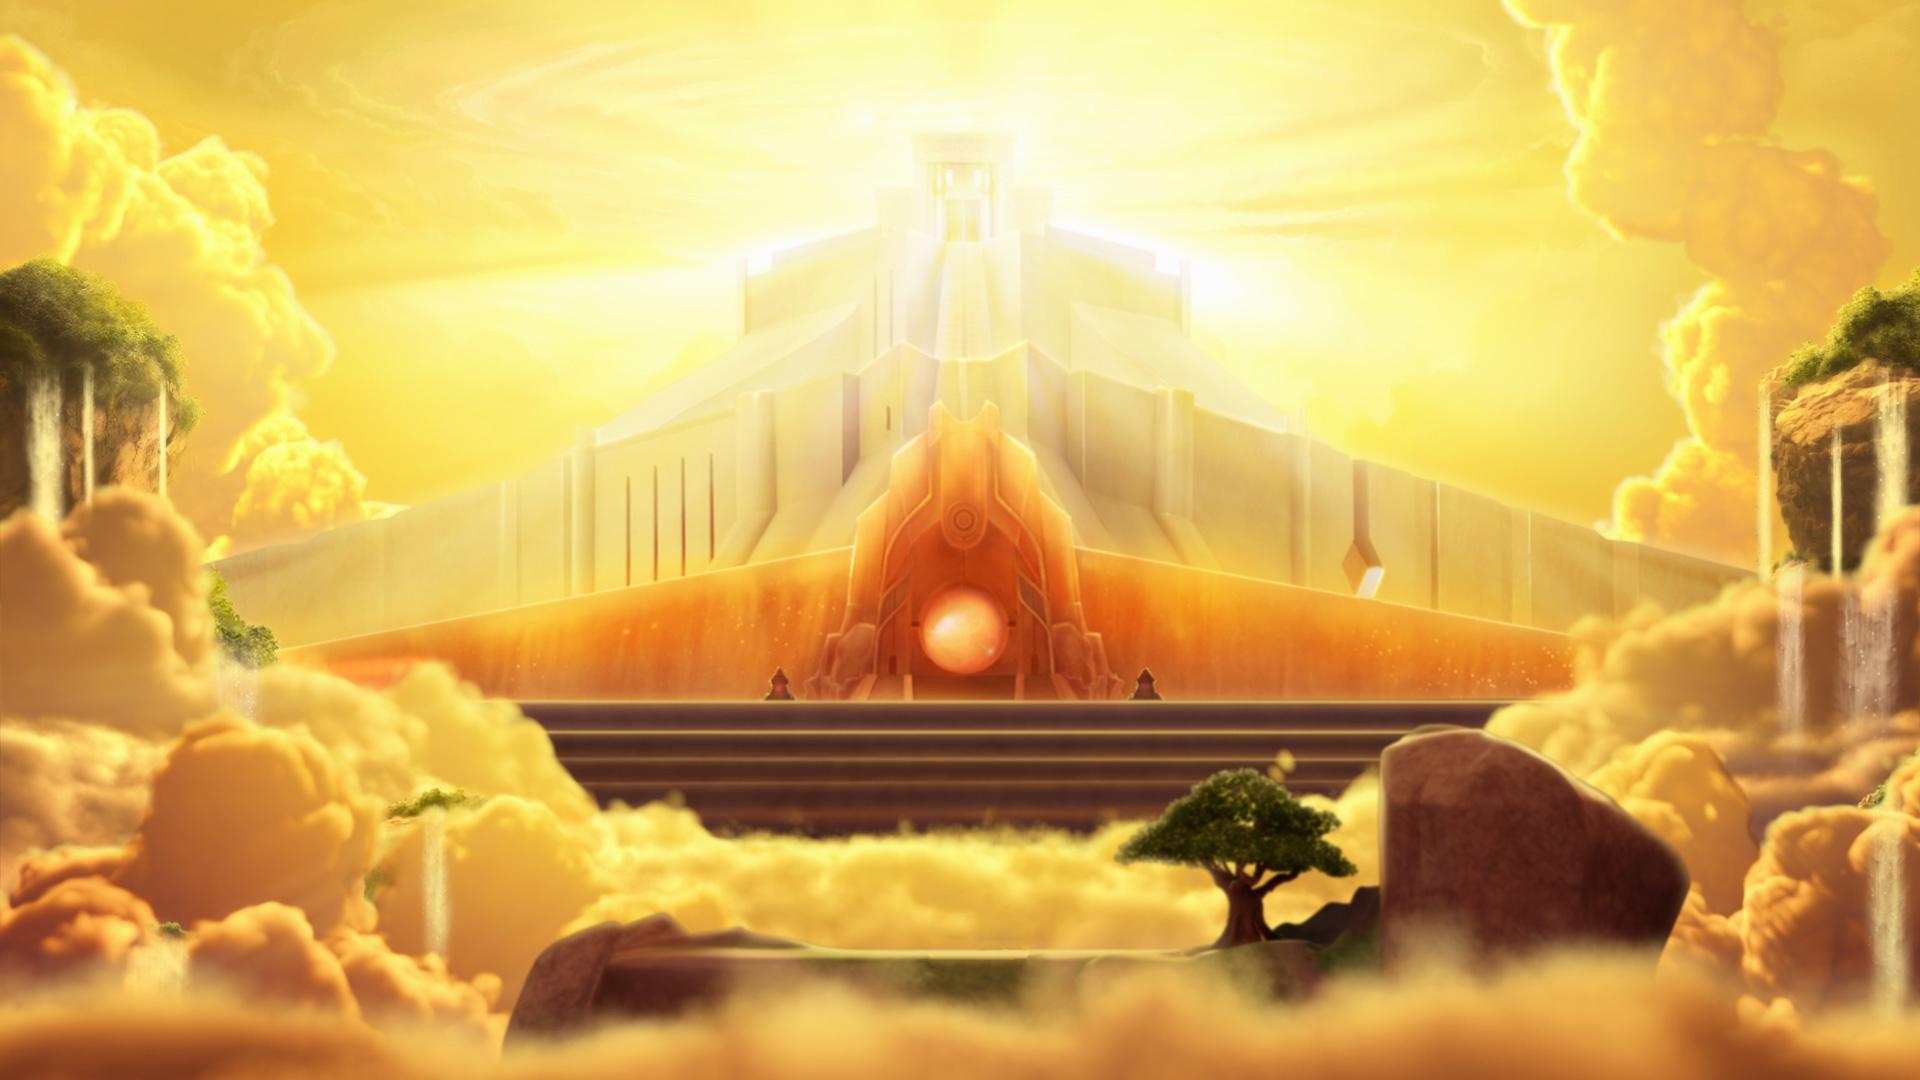 Superbook's Heaven #2 ceasle of God by AngeloVergil on ...